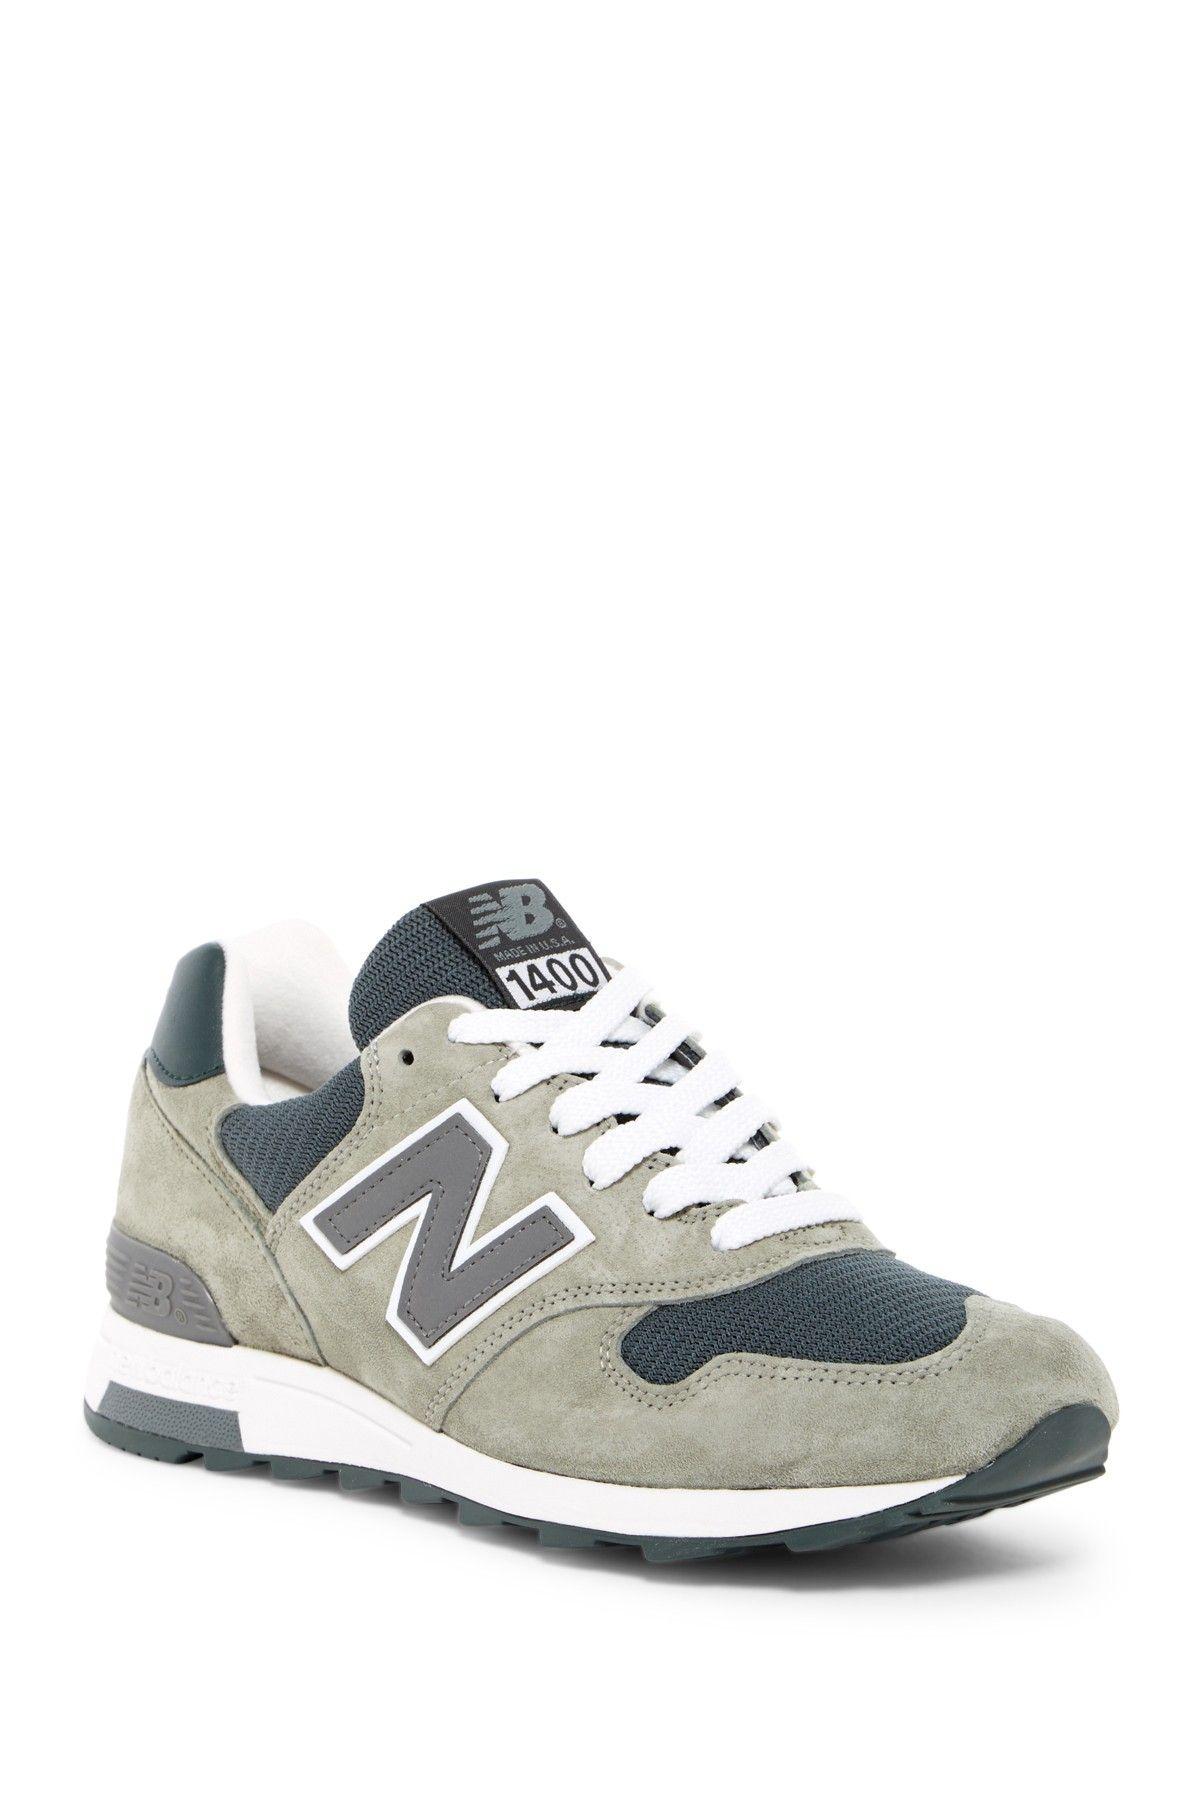 New Balance 1400 Sneaker Sneakers, New balance, Nordstrom